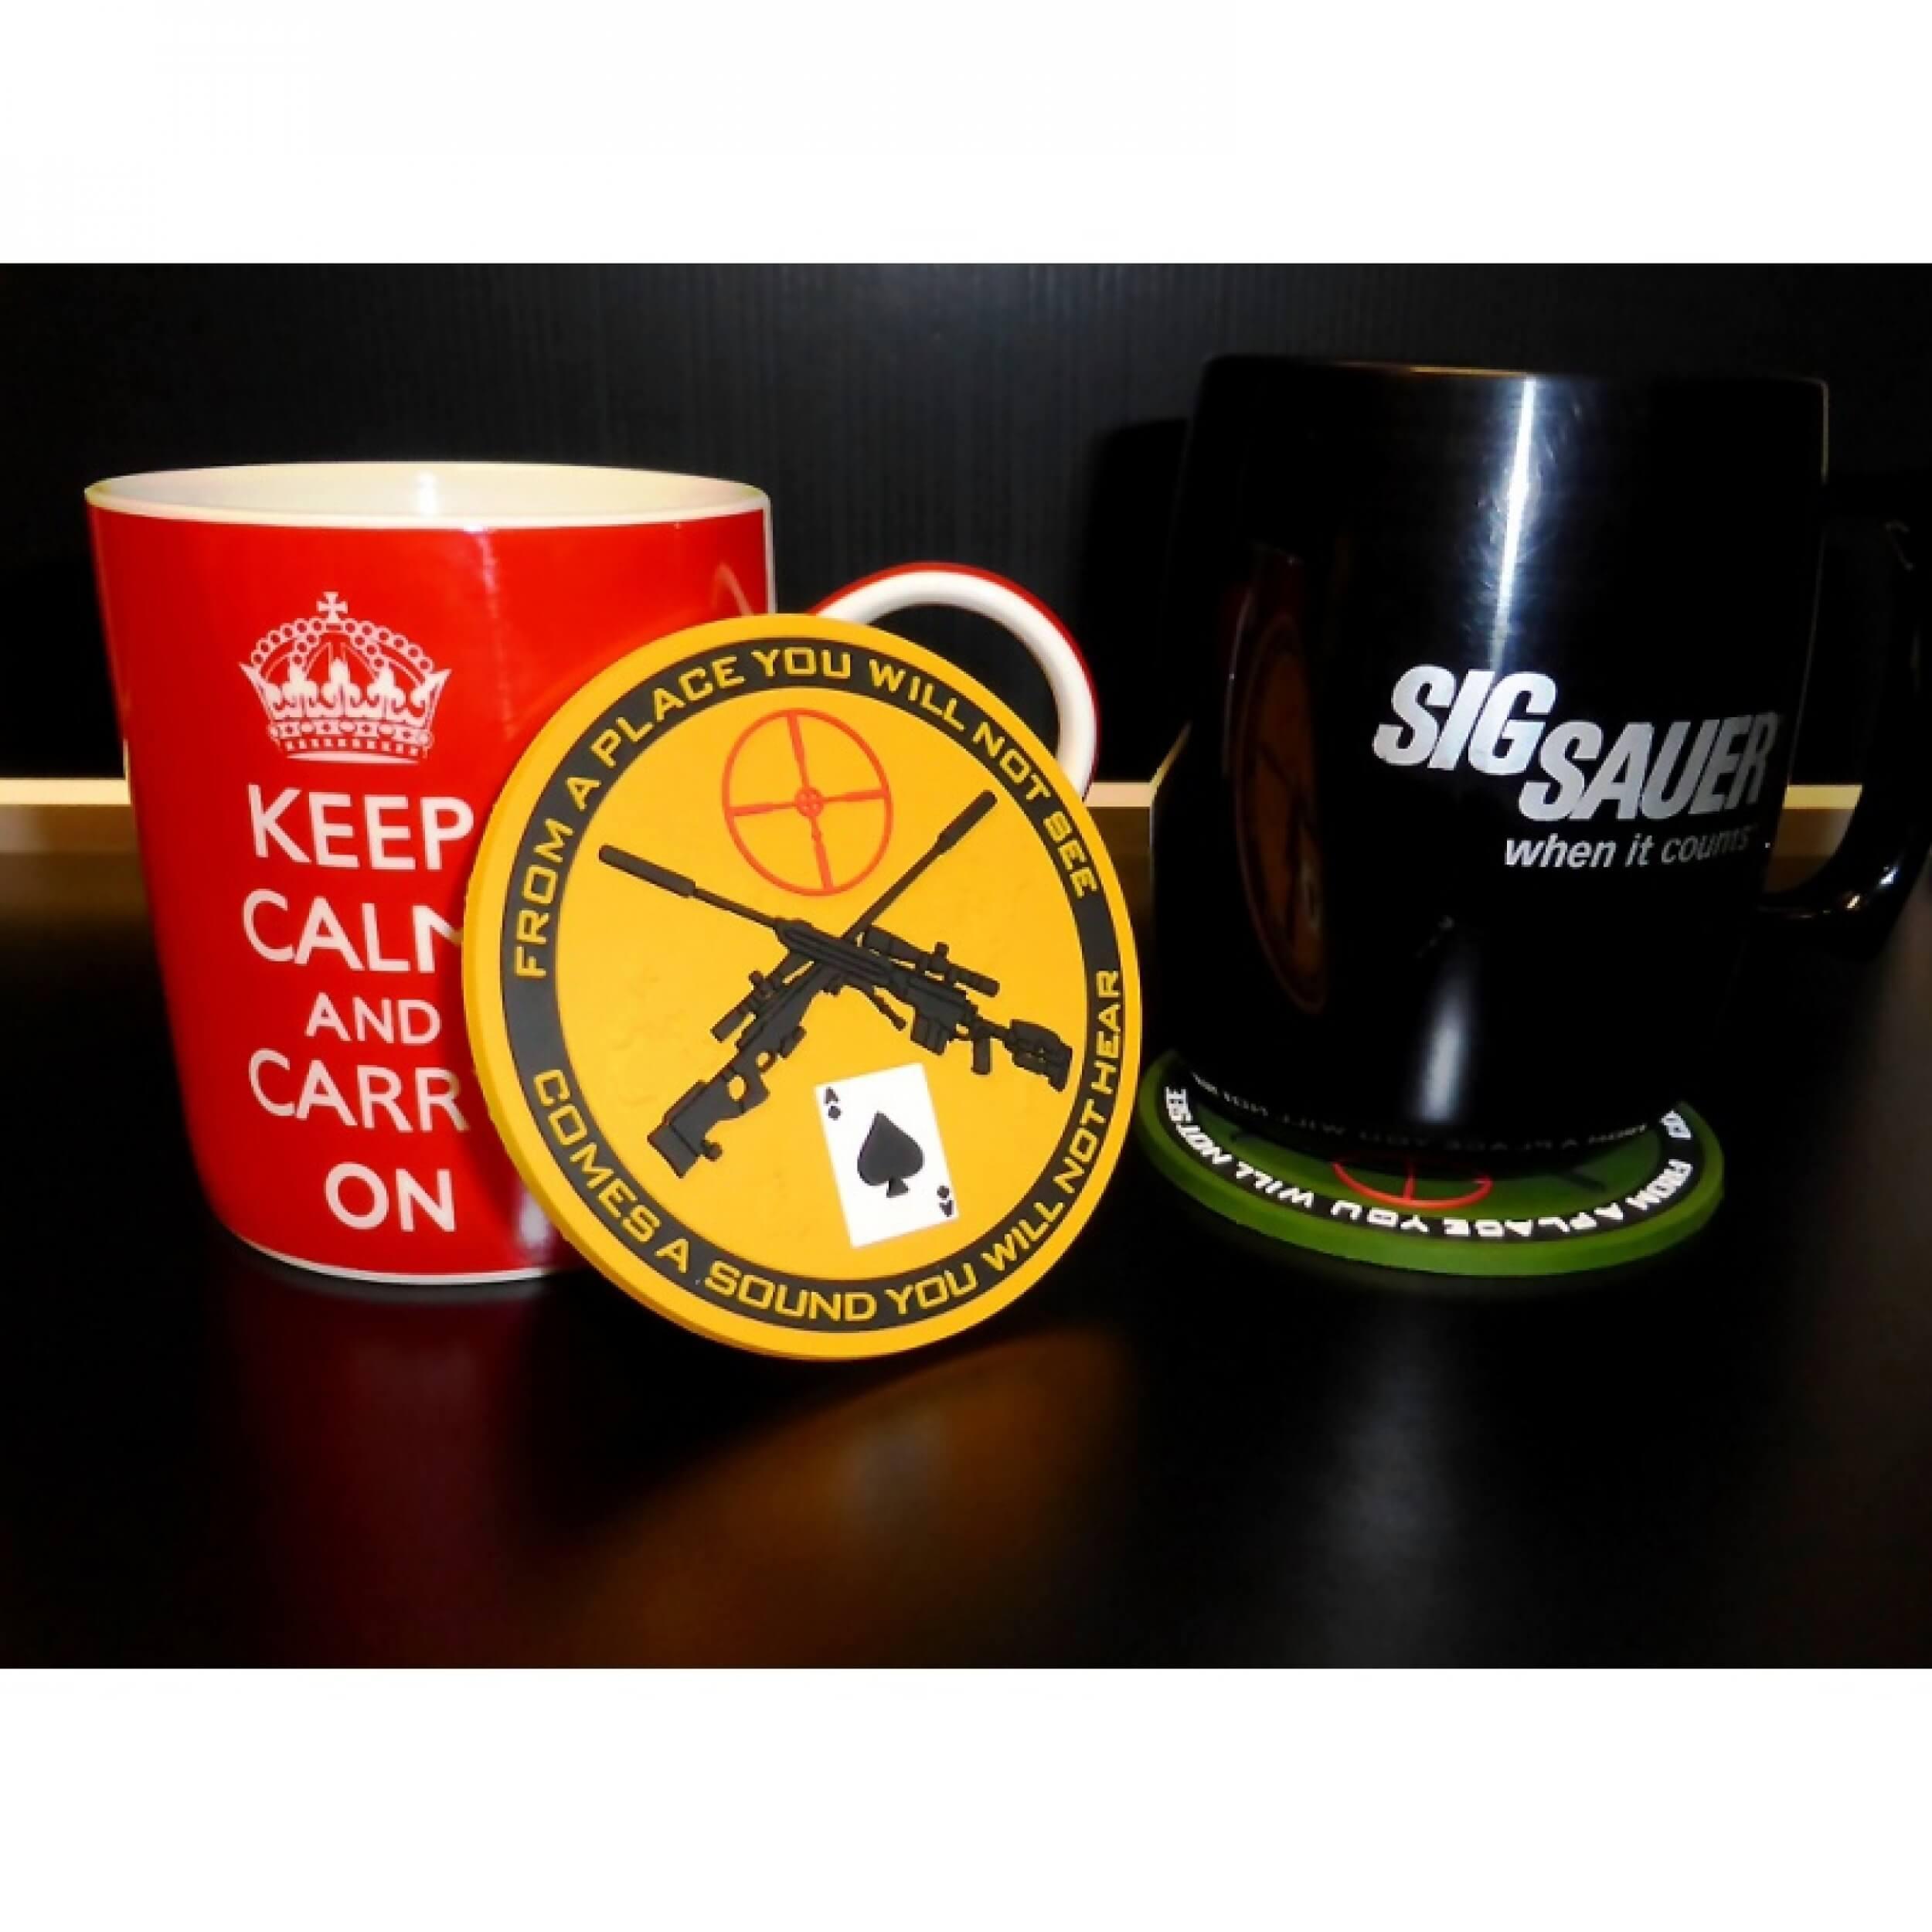 JTG - Sniper Coaster / Untersetzer, blackops / 3D Rubber Bierdeckel